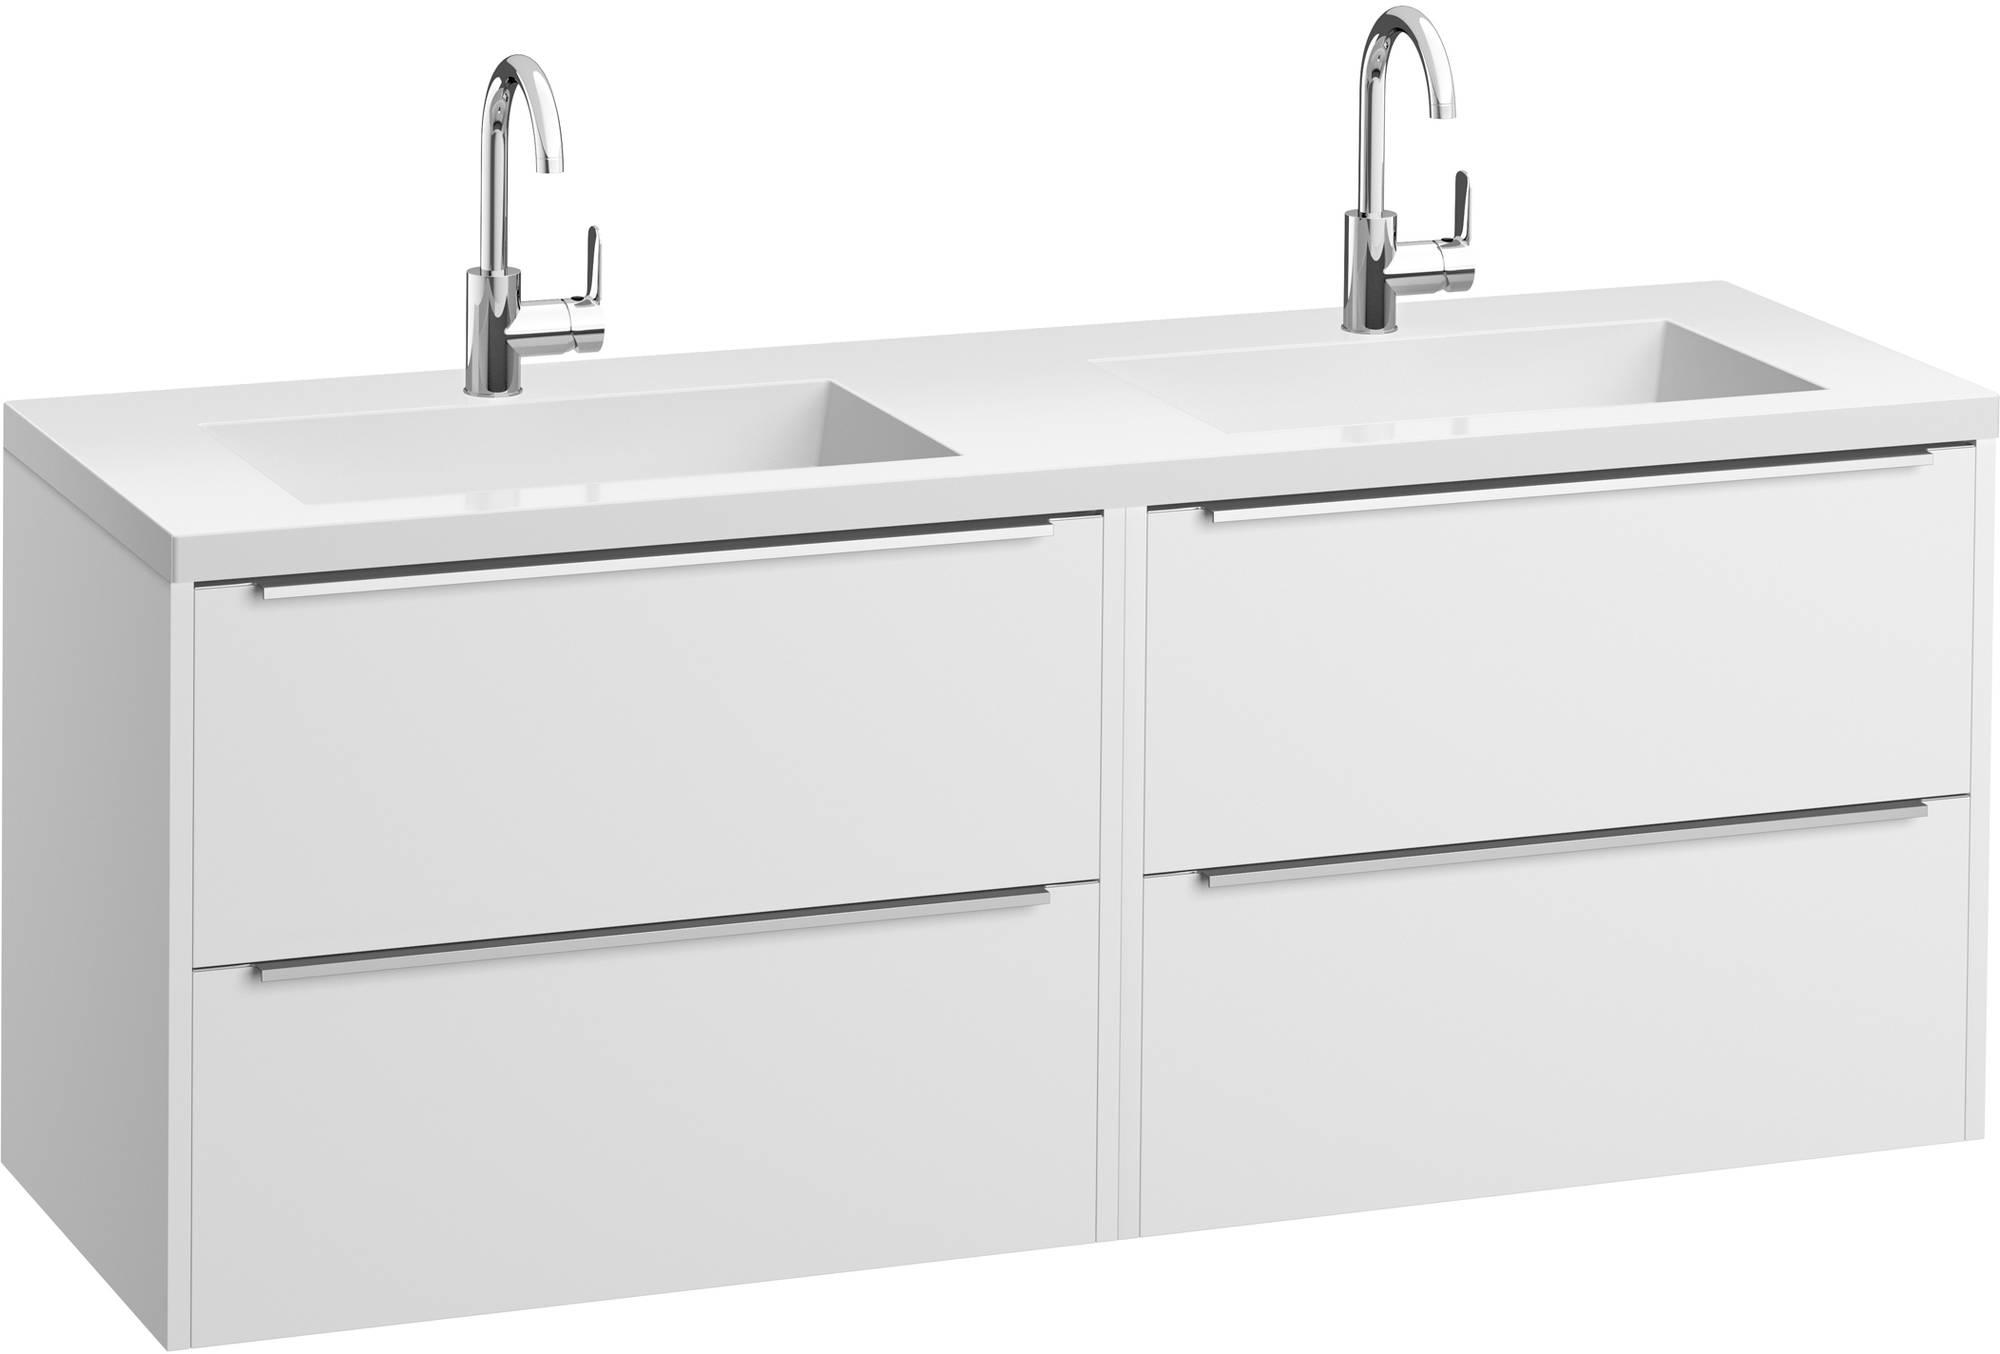 Saniselect Socan meubelset 4 lades met dubbele mineraalmarmere wastafel 160cm Mat Wit